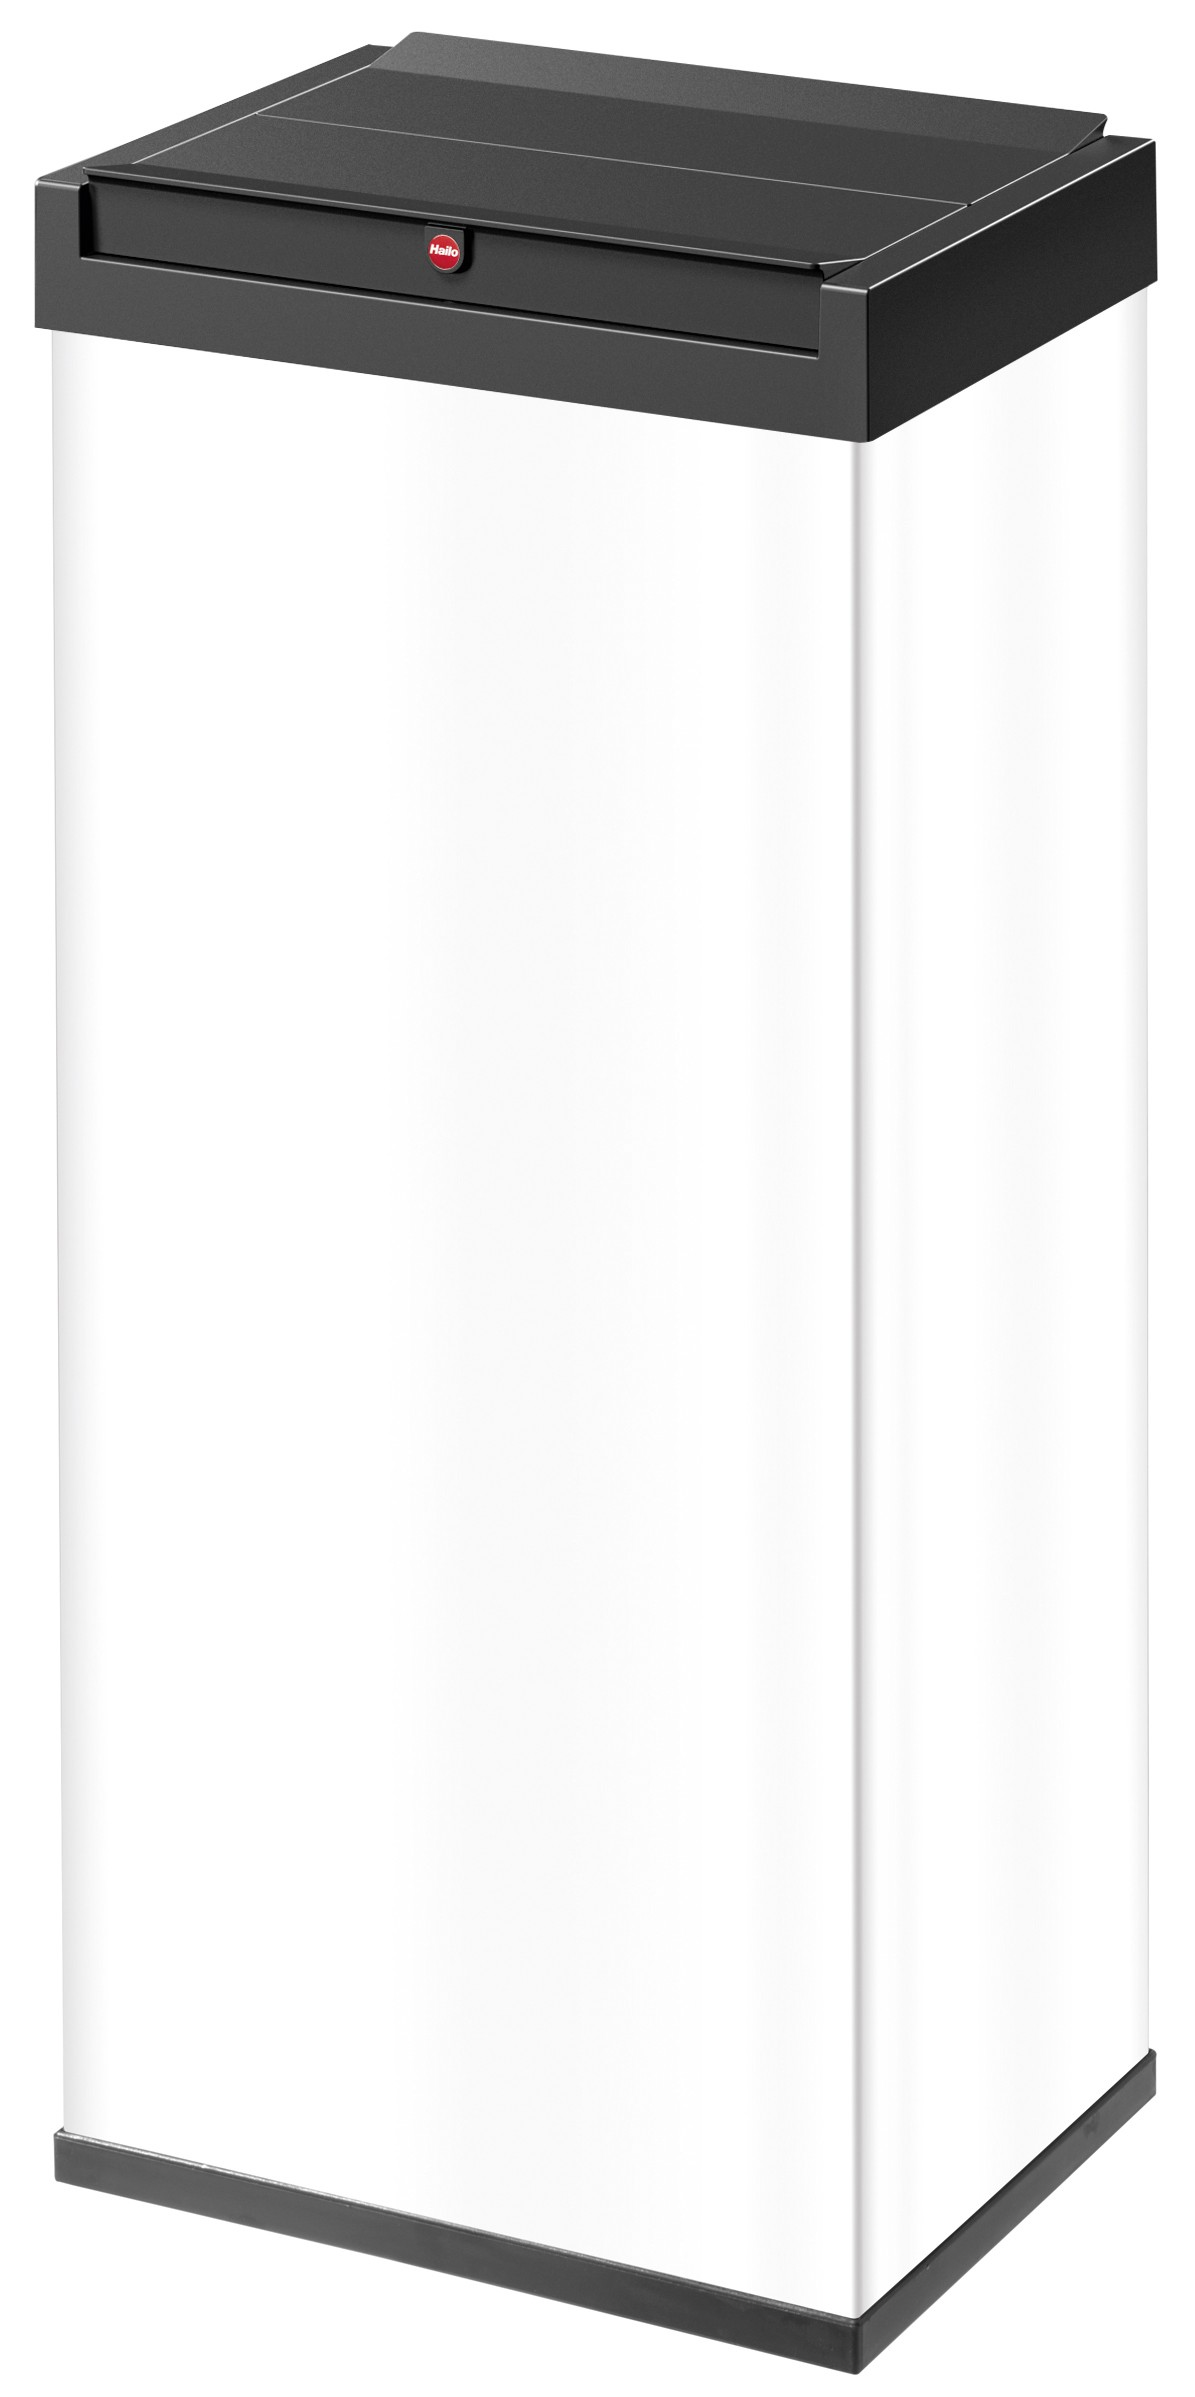 Hailo Big-Box Swing XL, weiß, 52 Liter, Großraum-Abfallbox